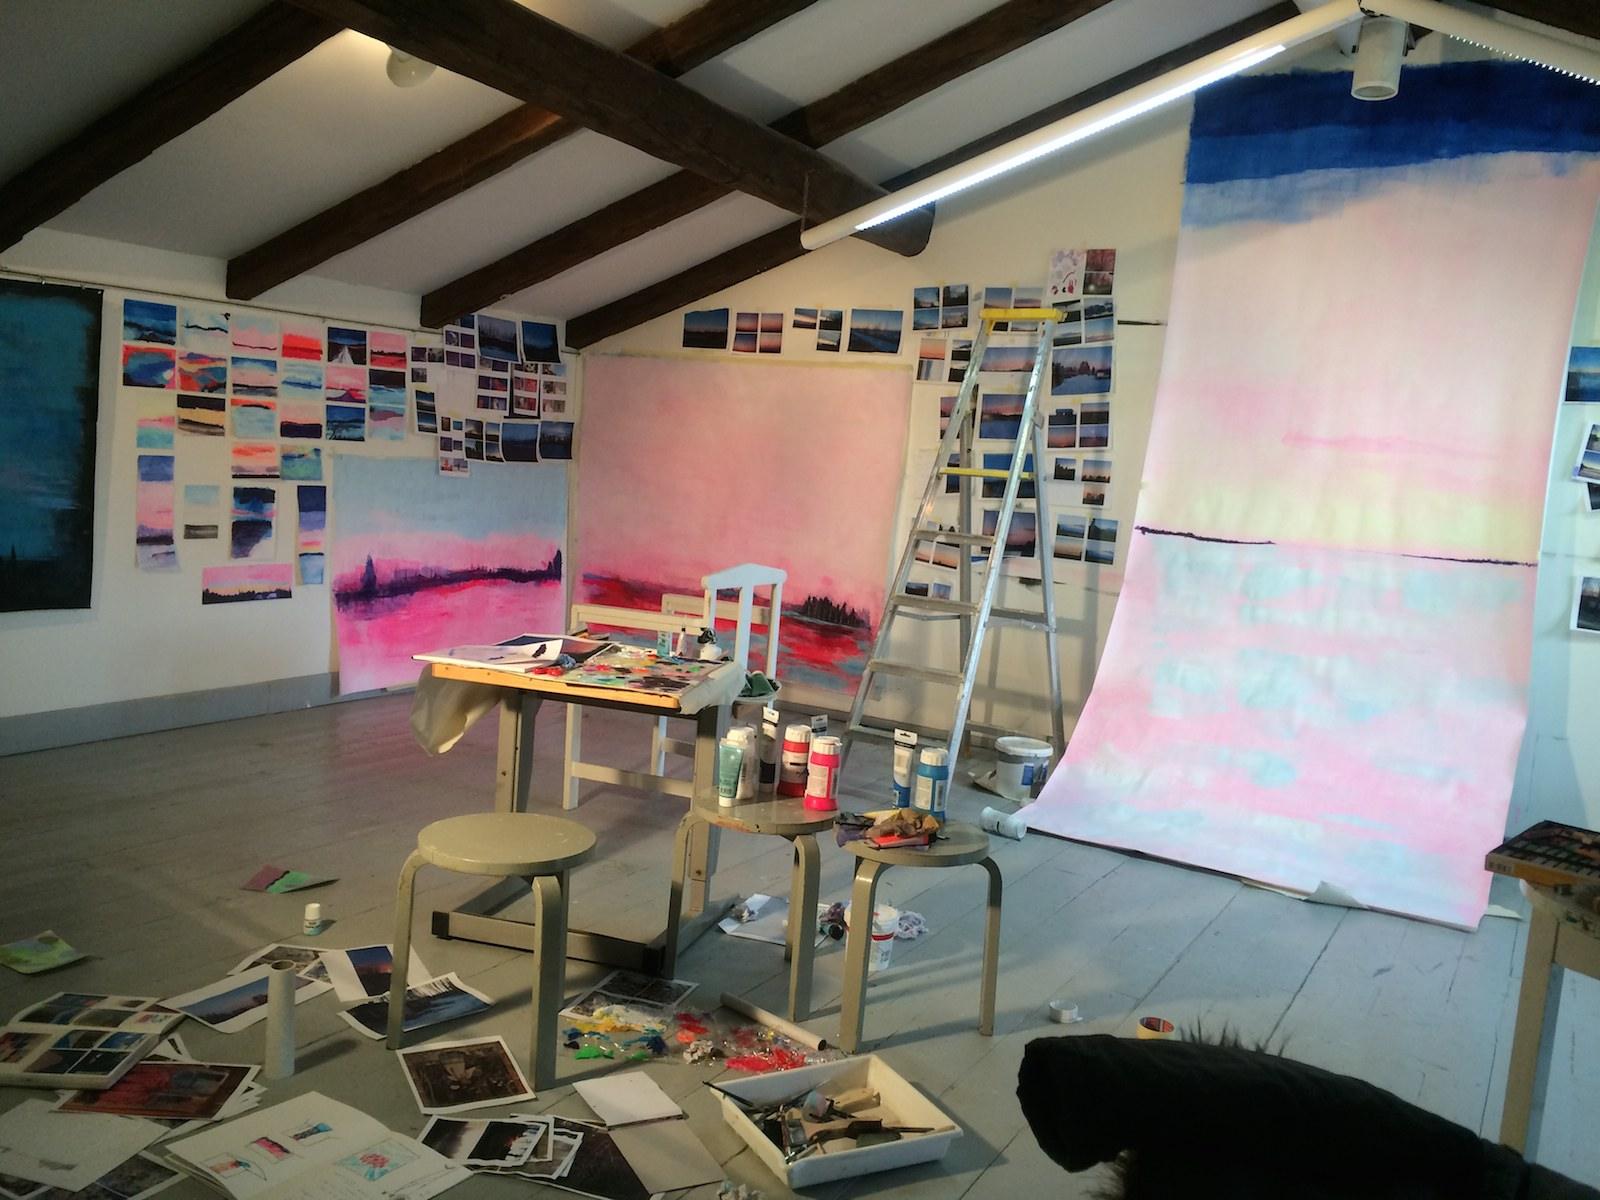 Residency studio at Atelje Stundars, , Jane Hughes Stundars Museum, Solf, Finland, 2015